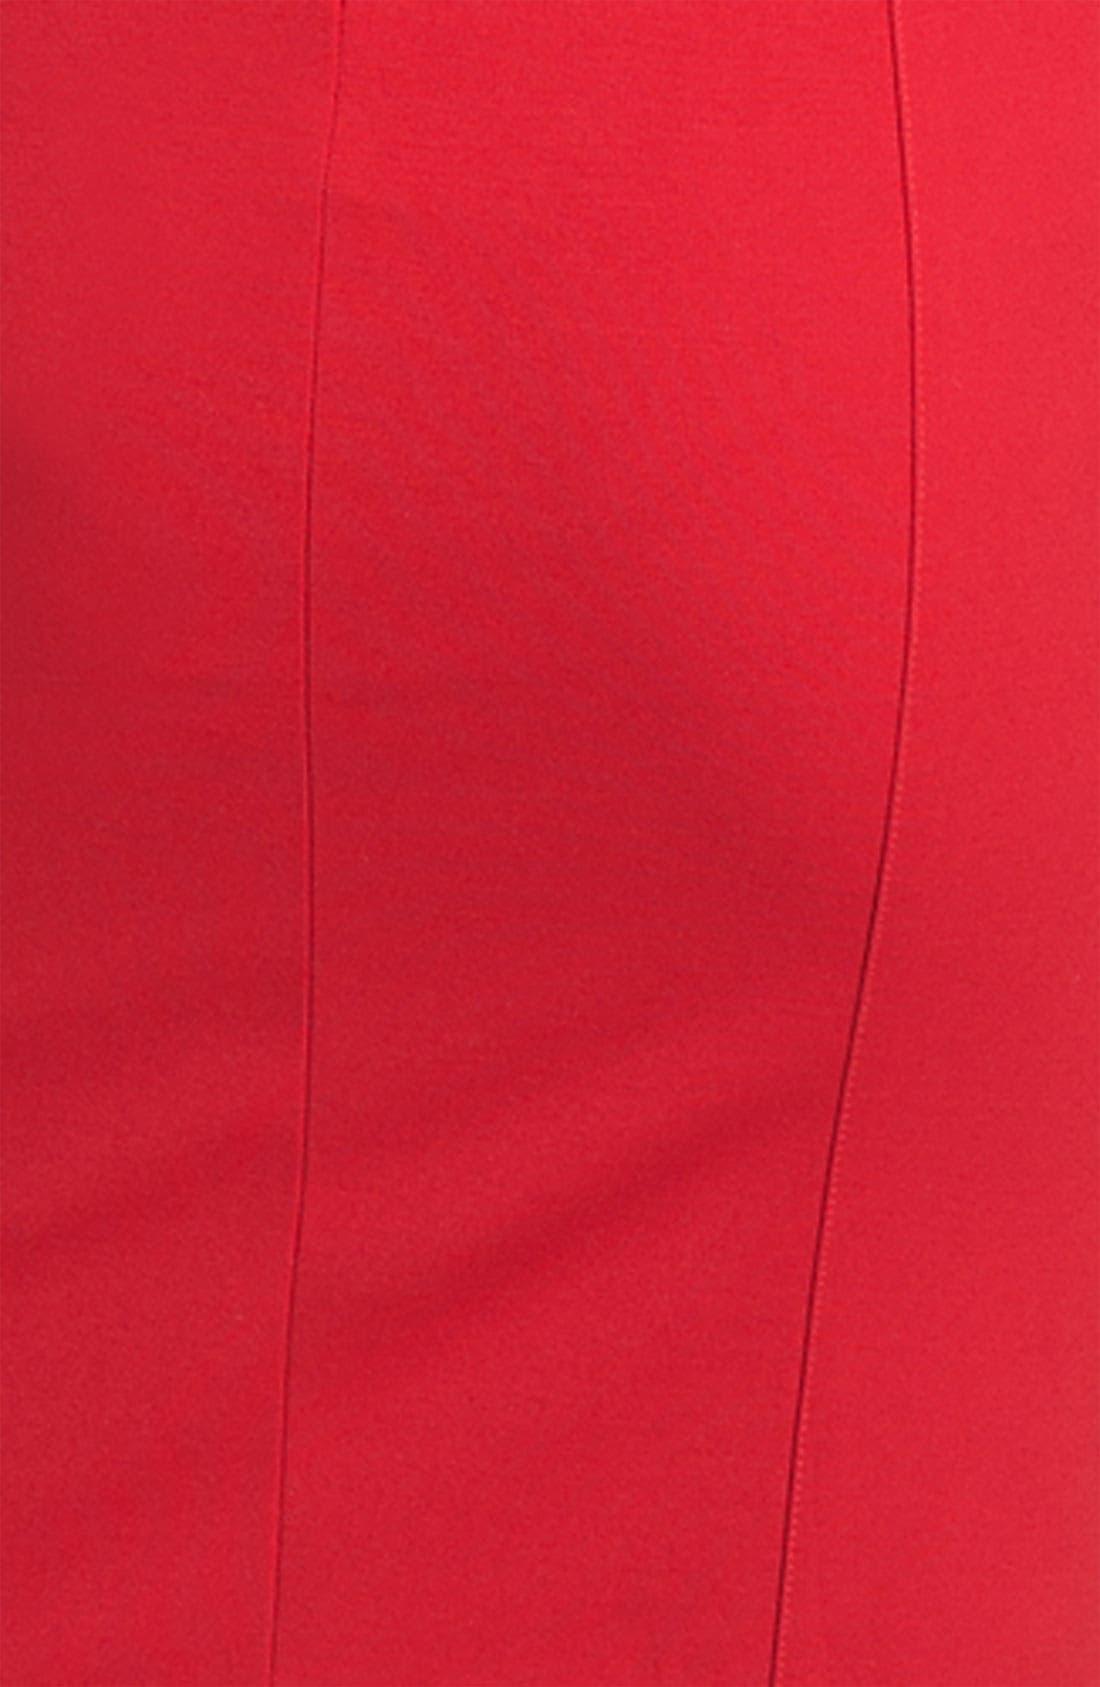 Alternate Image 3  - Ted Baker London 'Edella' Embellished Sheath Dress